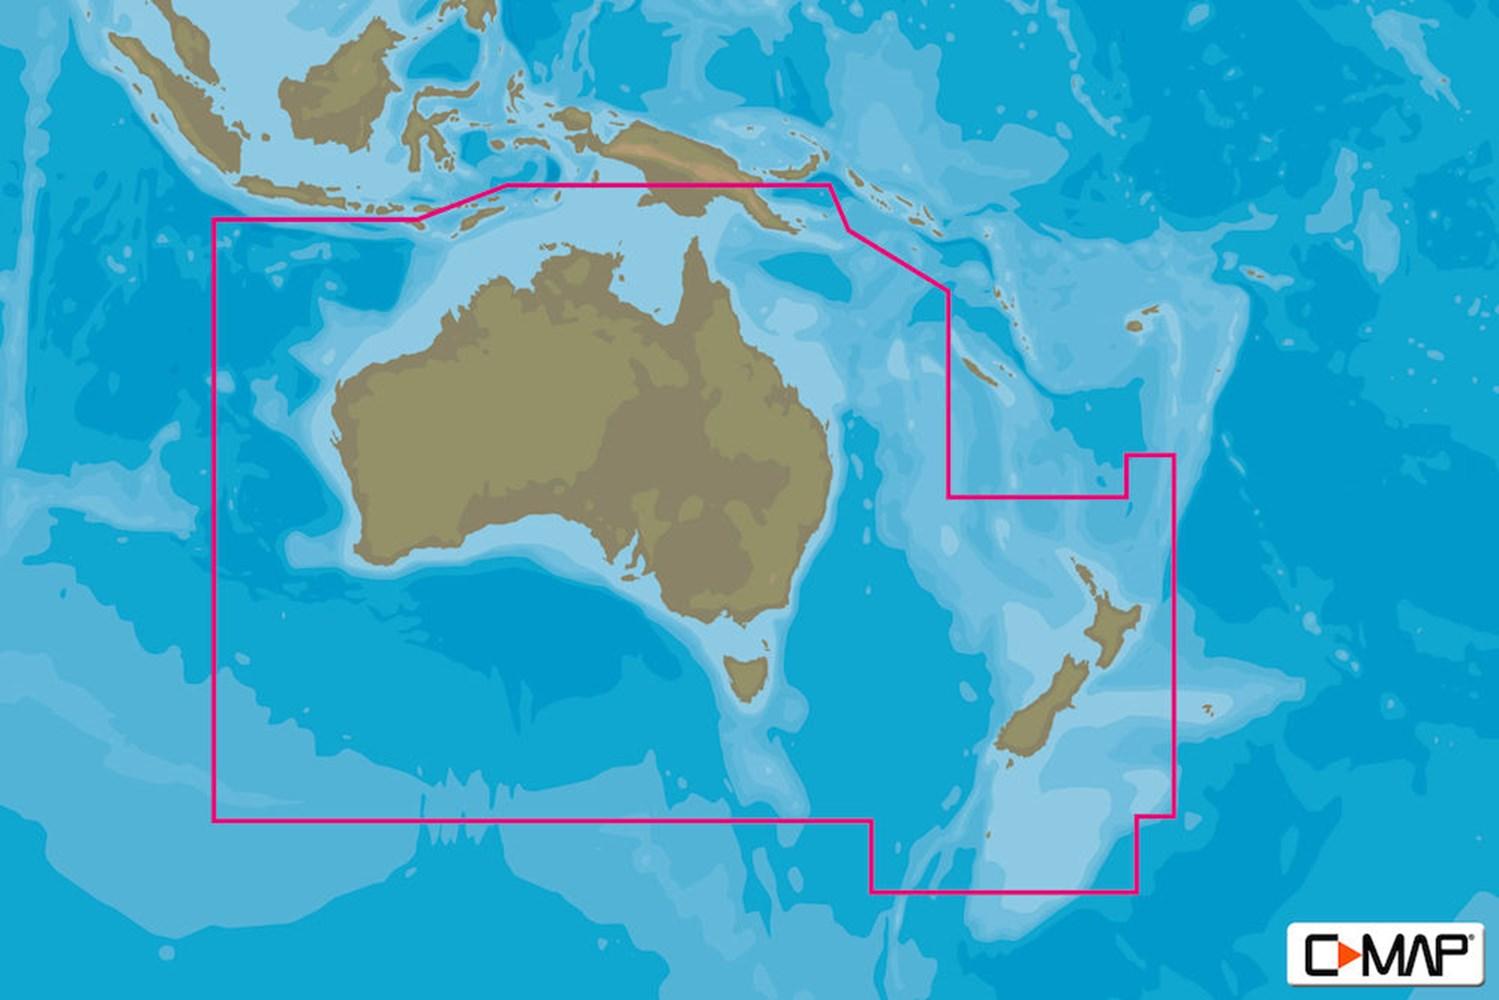 Australia Map Zoom.C Map Max N C Australia Coastal Contl Lowrance